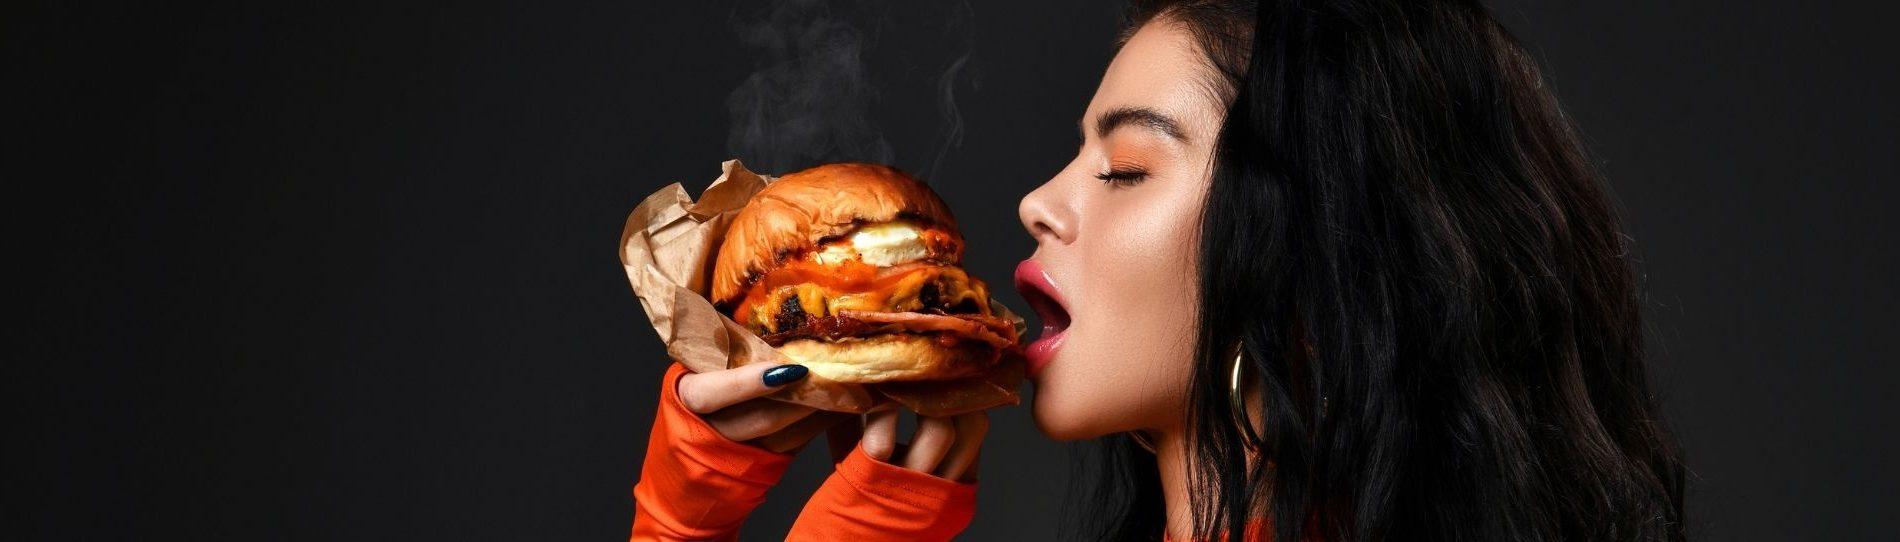 burgers babes and boobs header